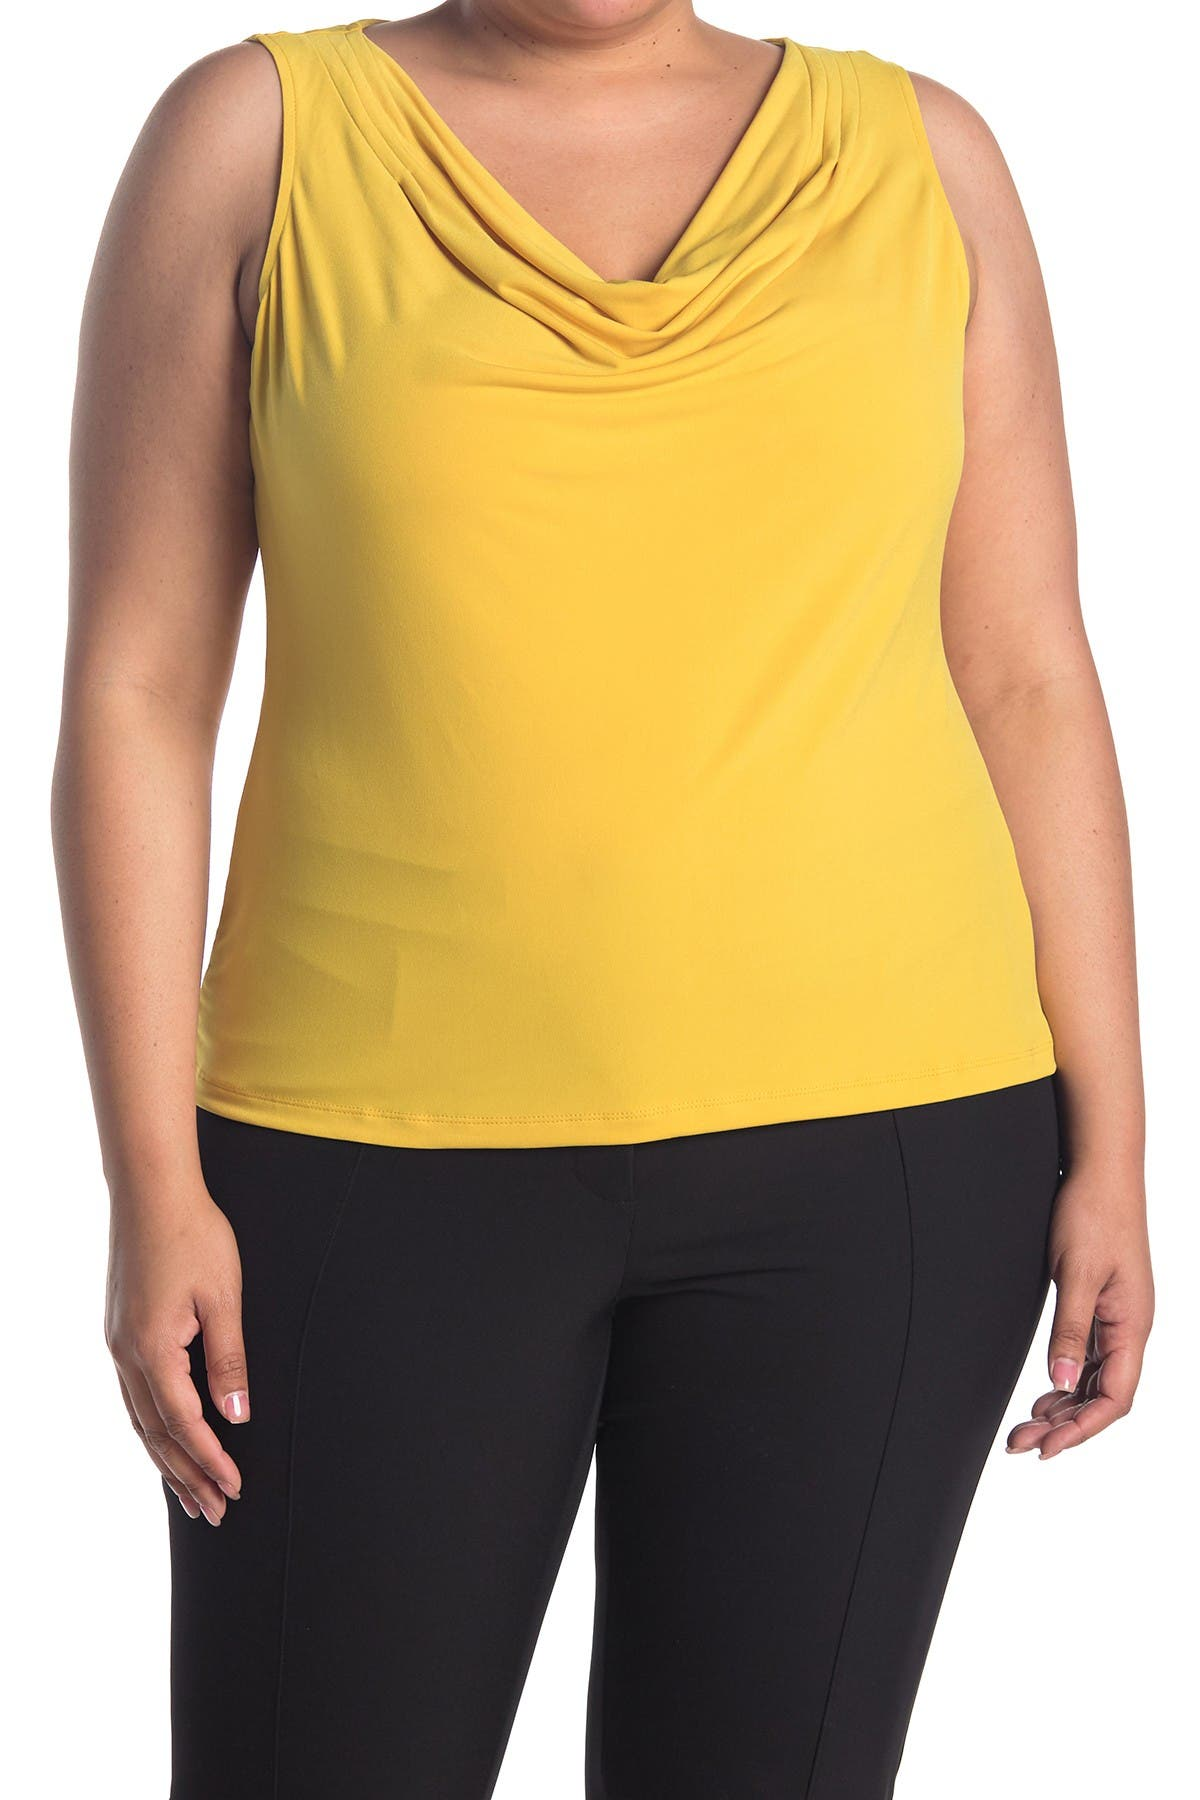 Image of Catherine Malandrino Drape Neck Sleeveless Top